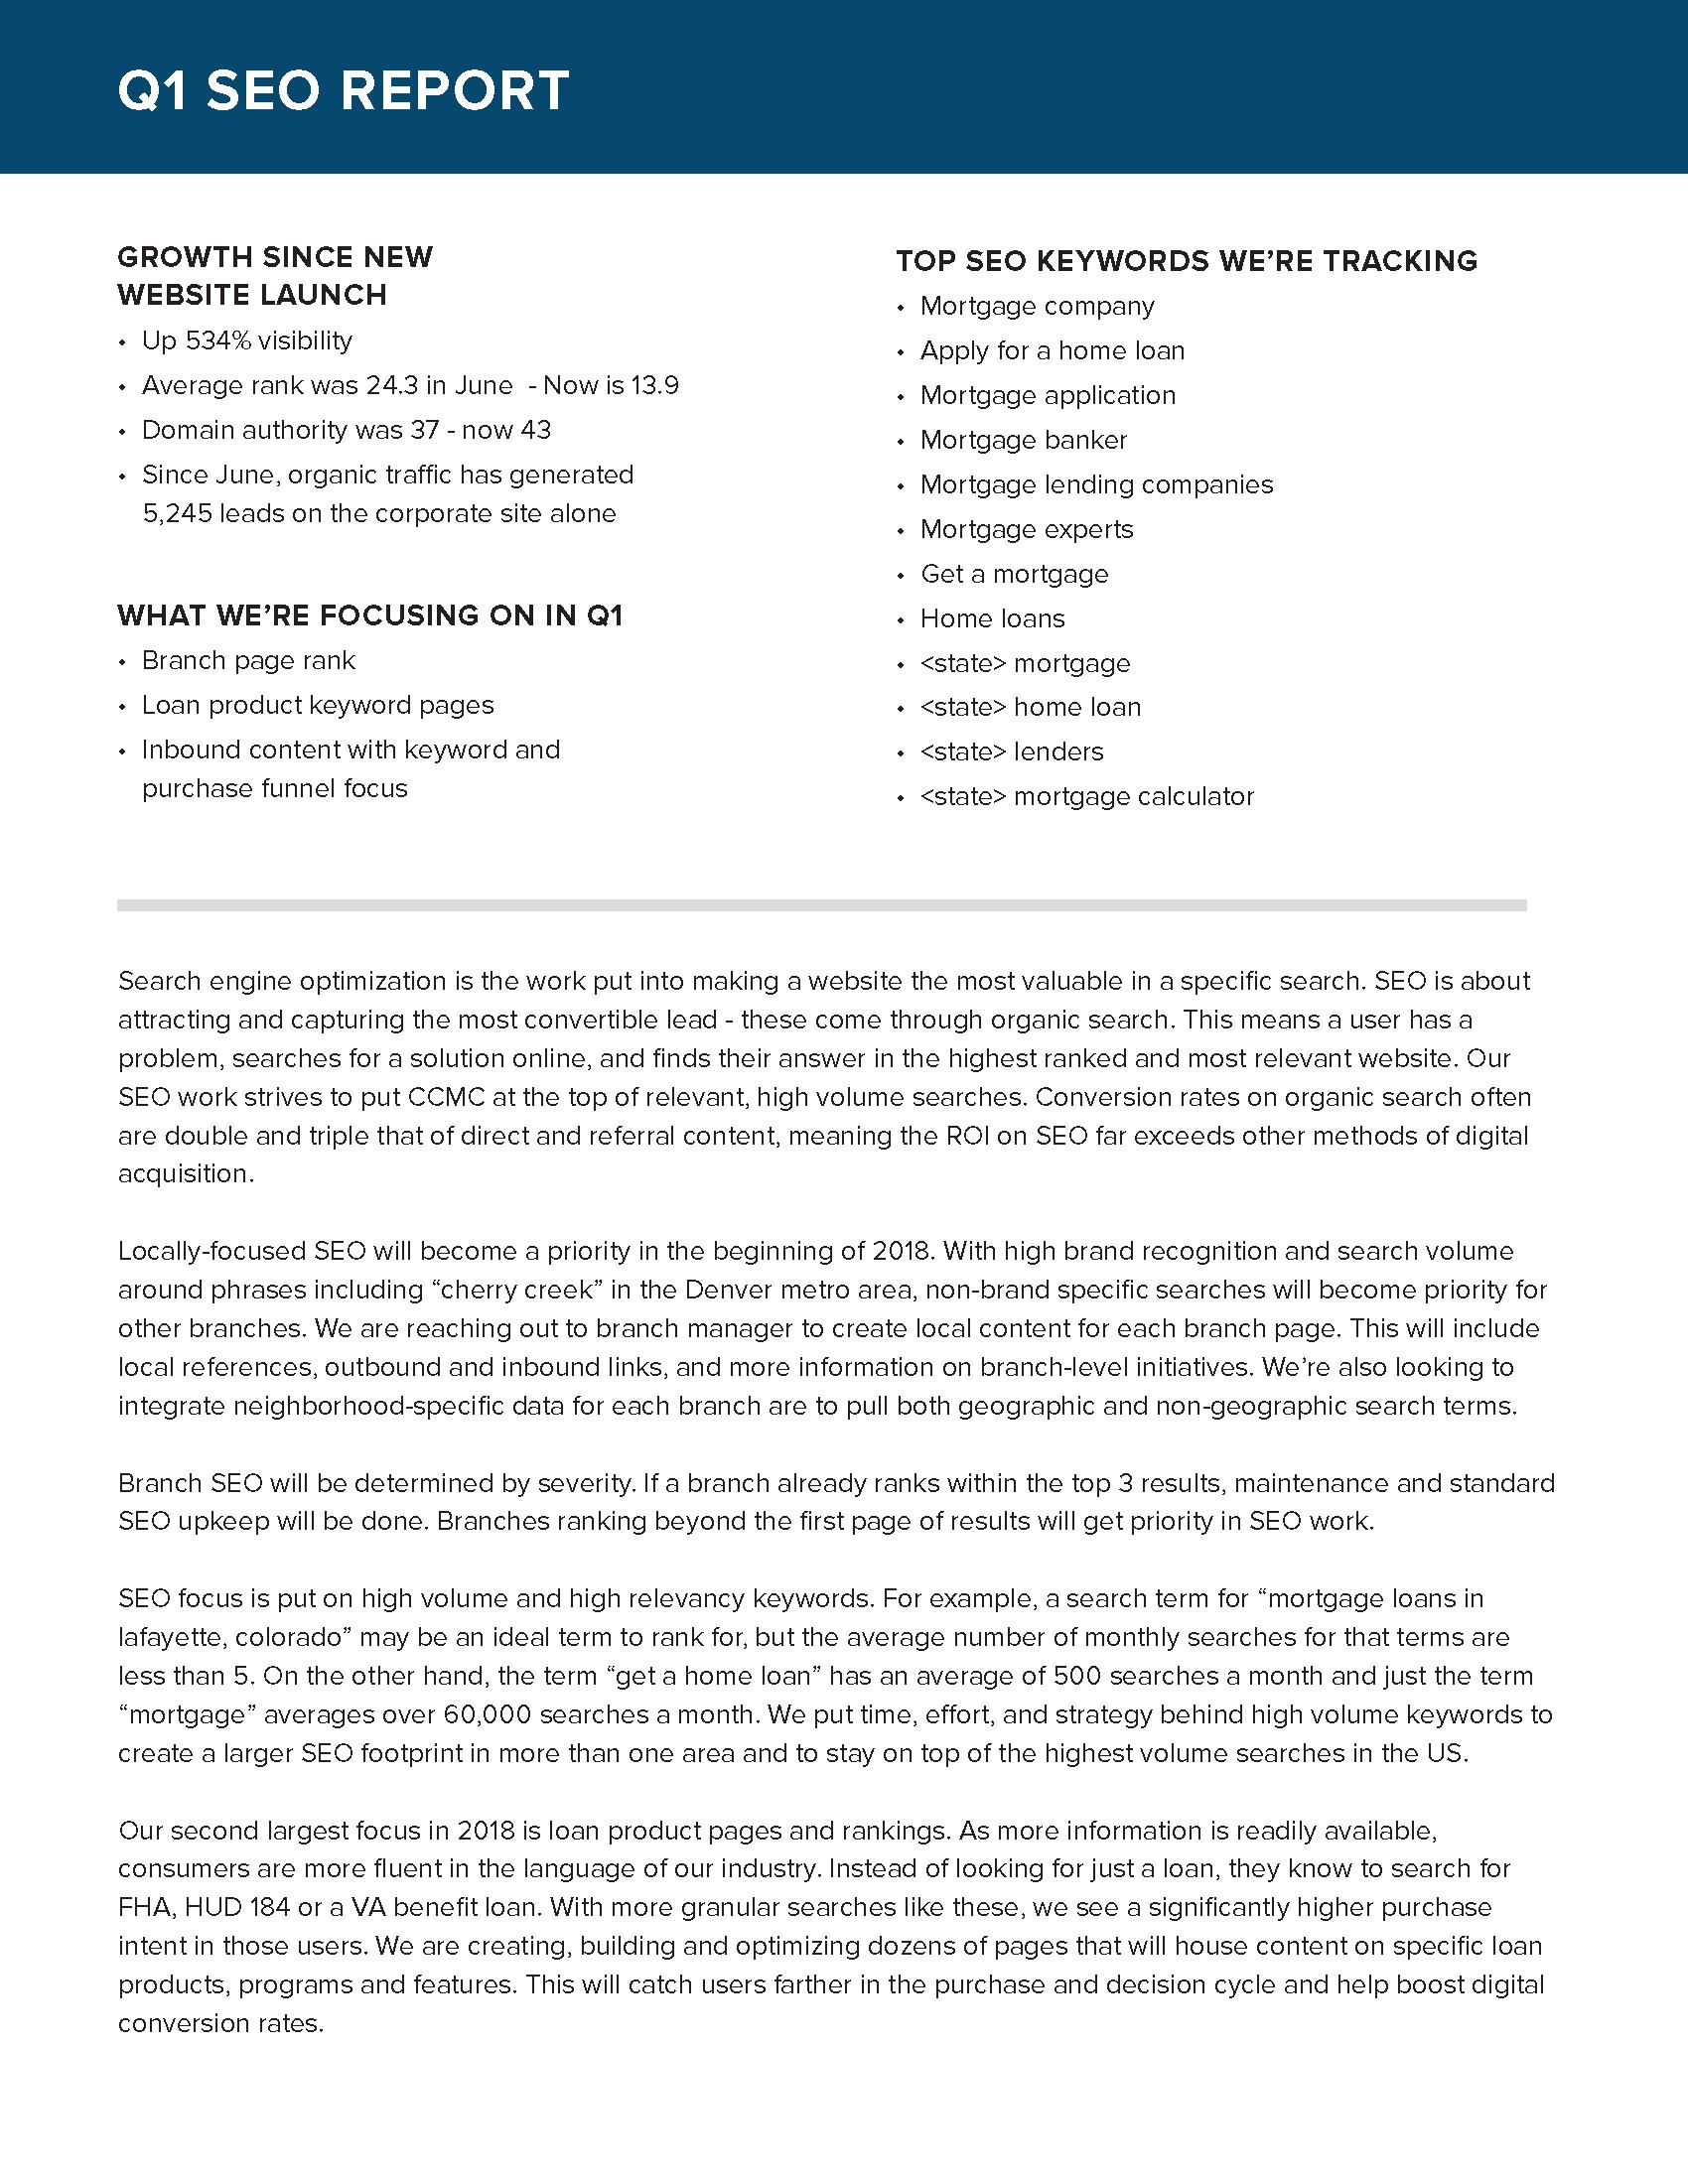 SEO-Report-Q1 (1).png